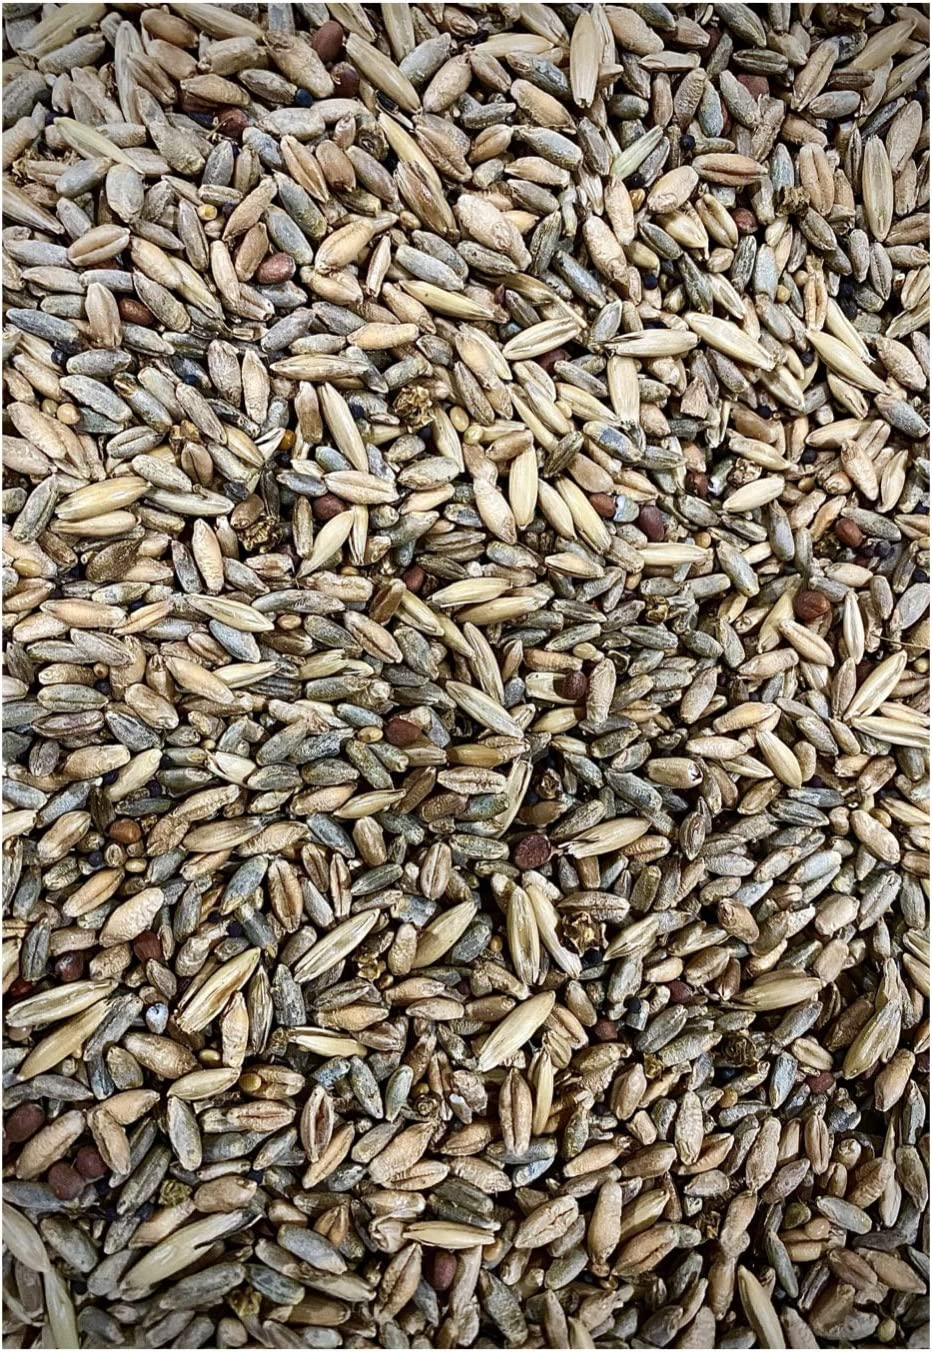 25lb Whitetail Deer Food Plot Seed | Turnip Radish Sugar Beet Clover Chicory Cereal Grain Rye Wheat Triticale Oats Mix | Thunder Prairie Blend